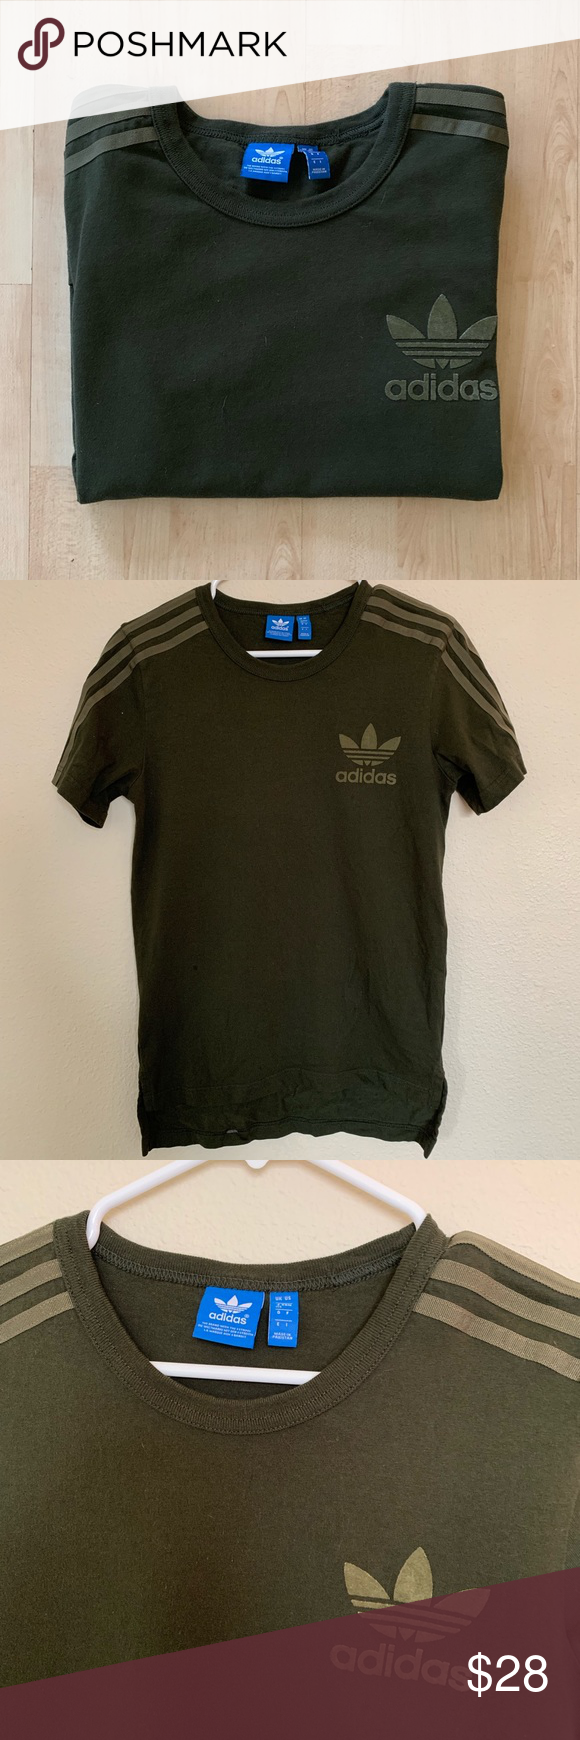 Adidas Originals Army Green Tee Japan